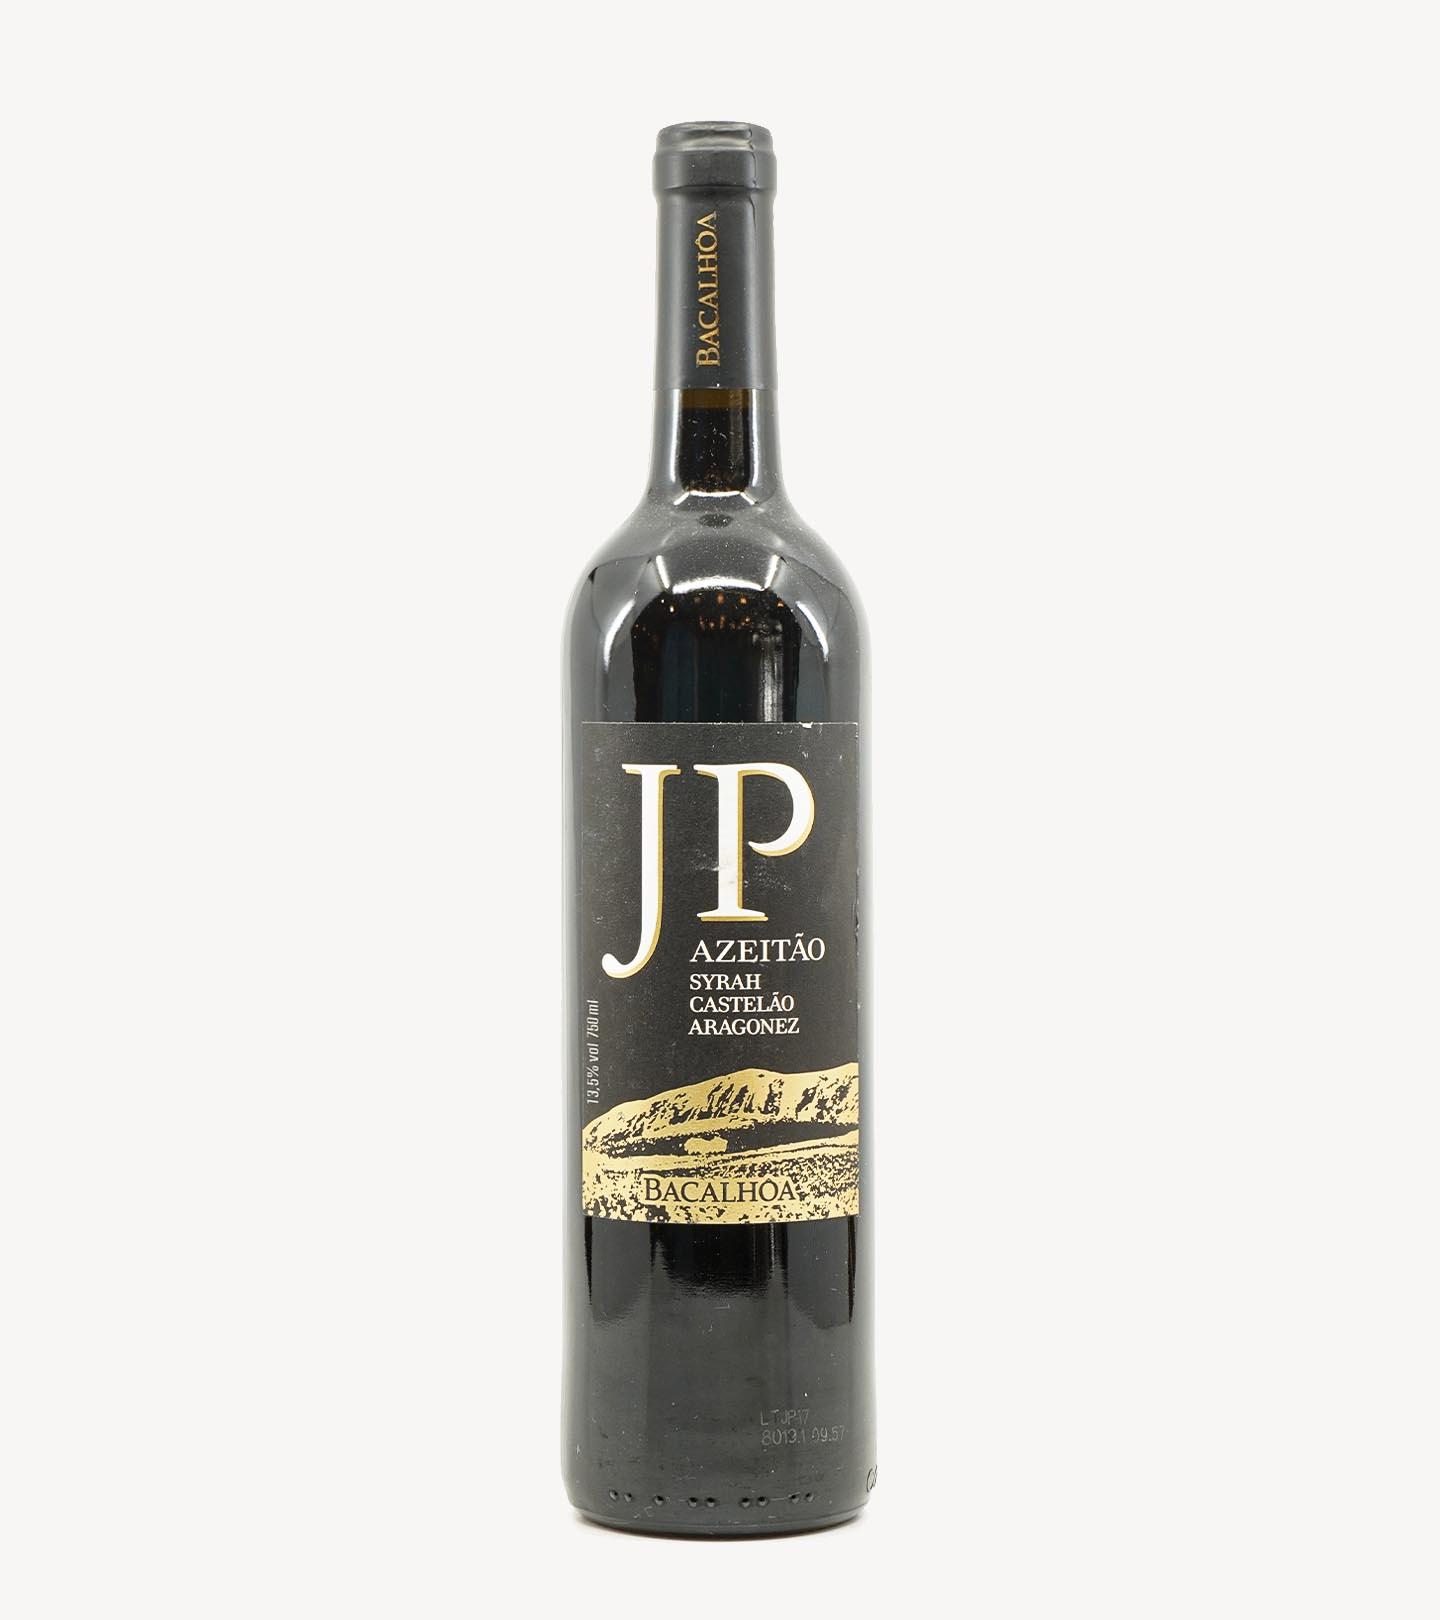 Vinho Tinto Península de Setúbal JP 75cl